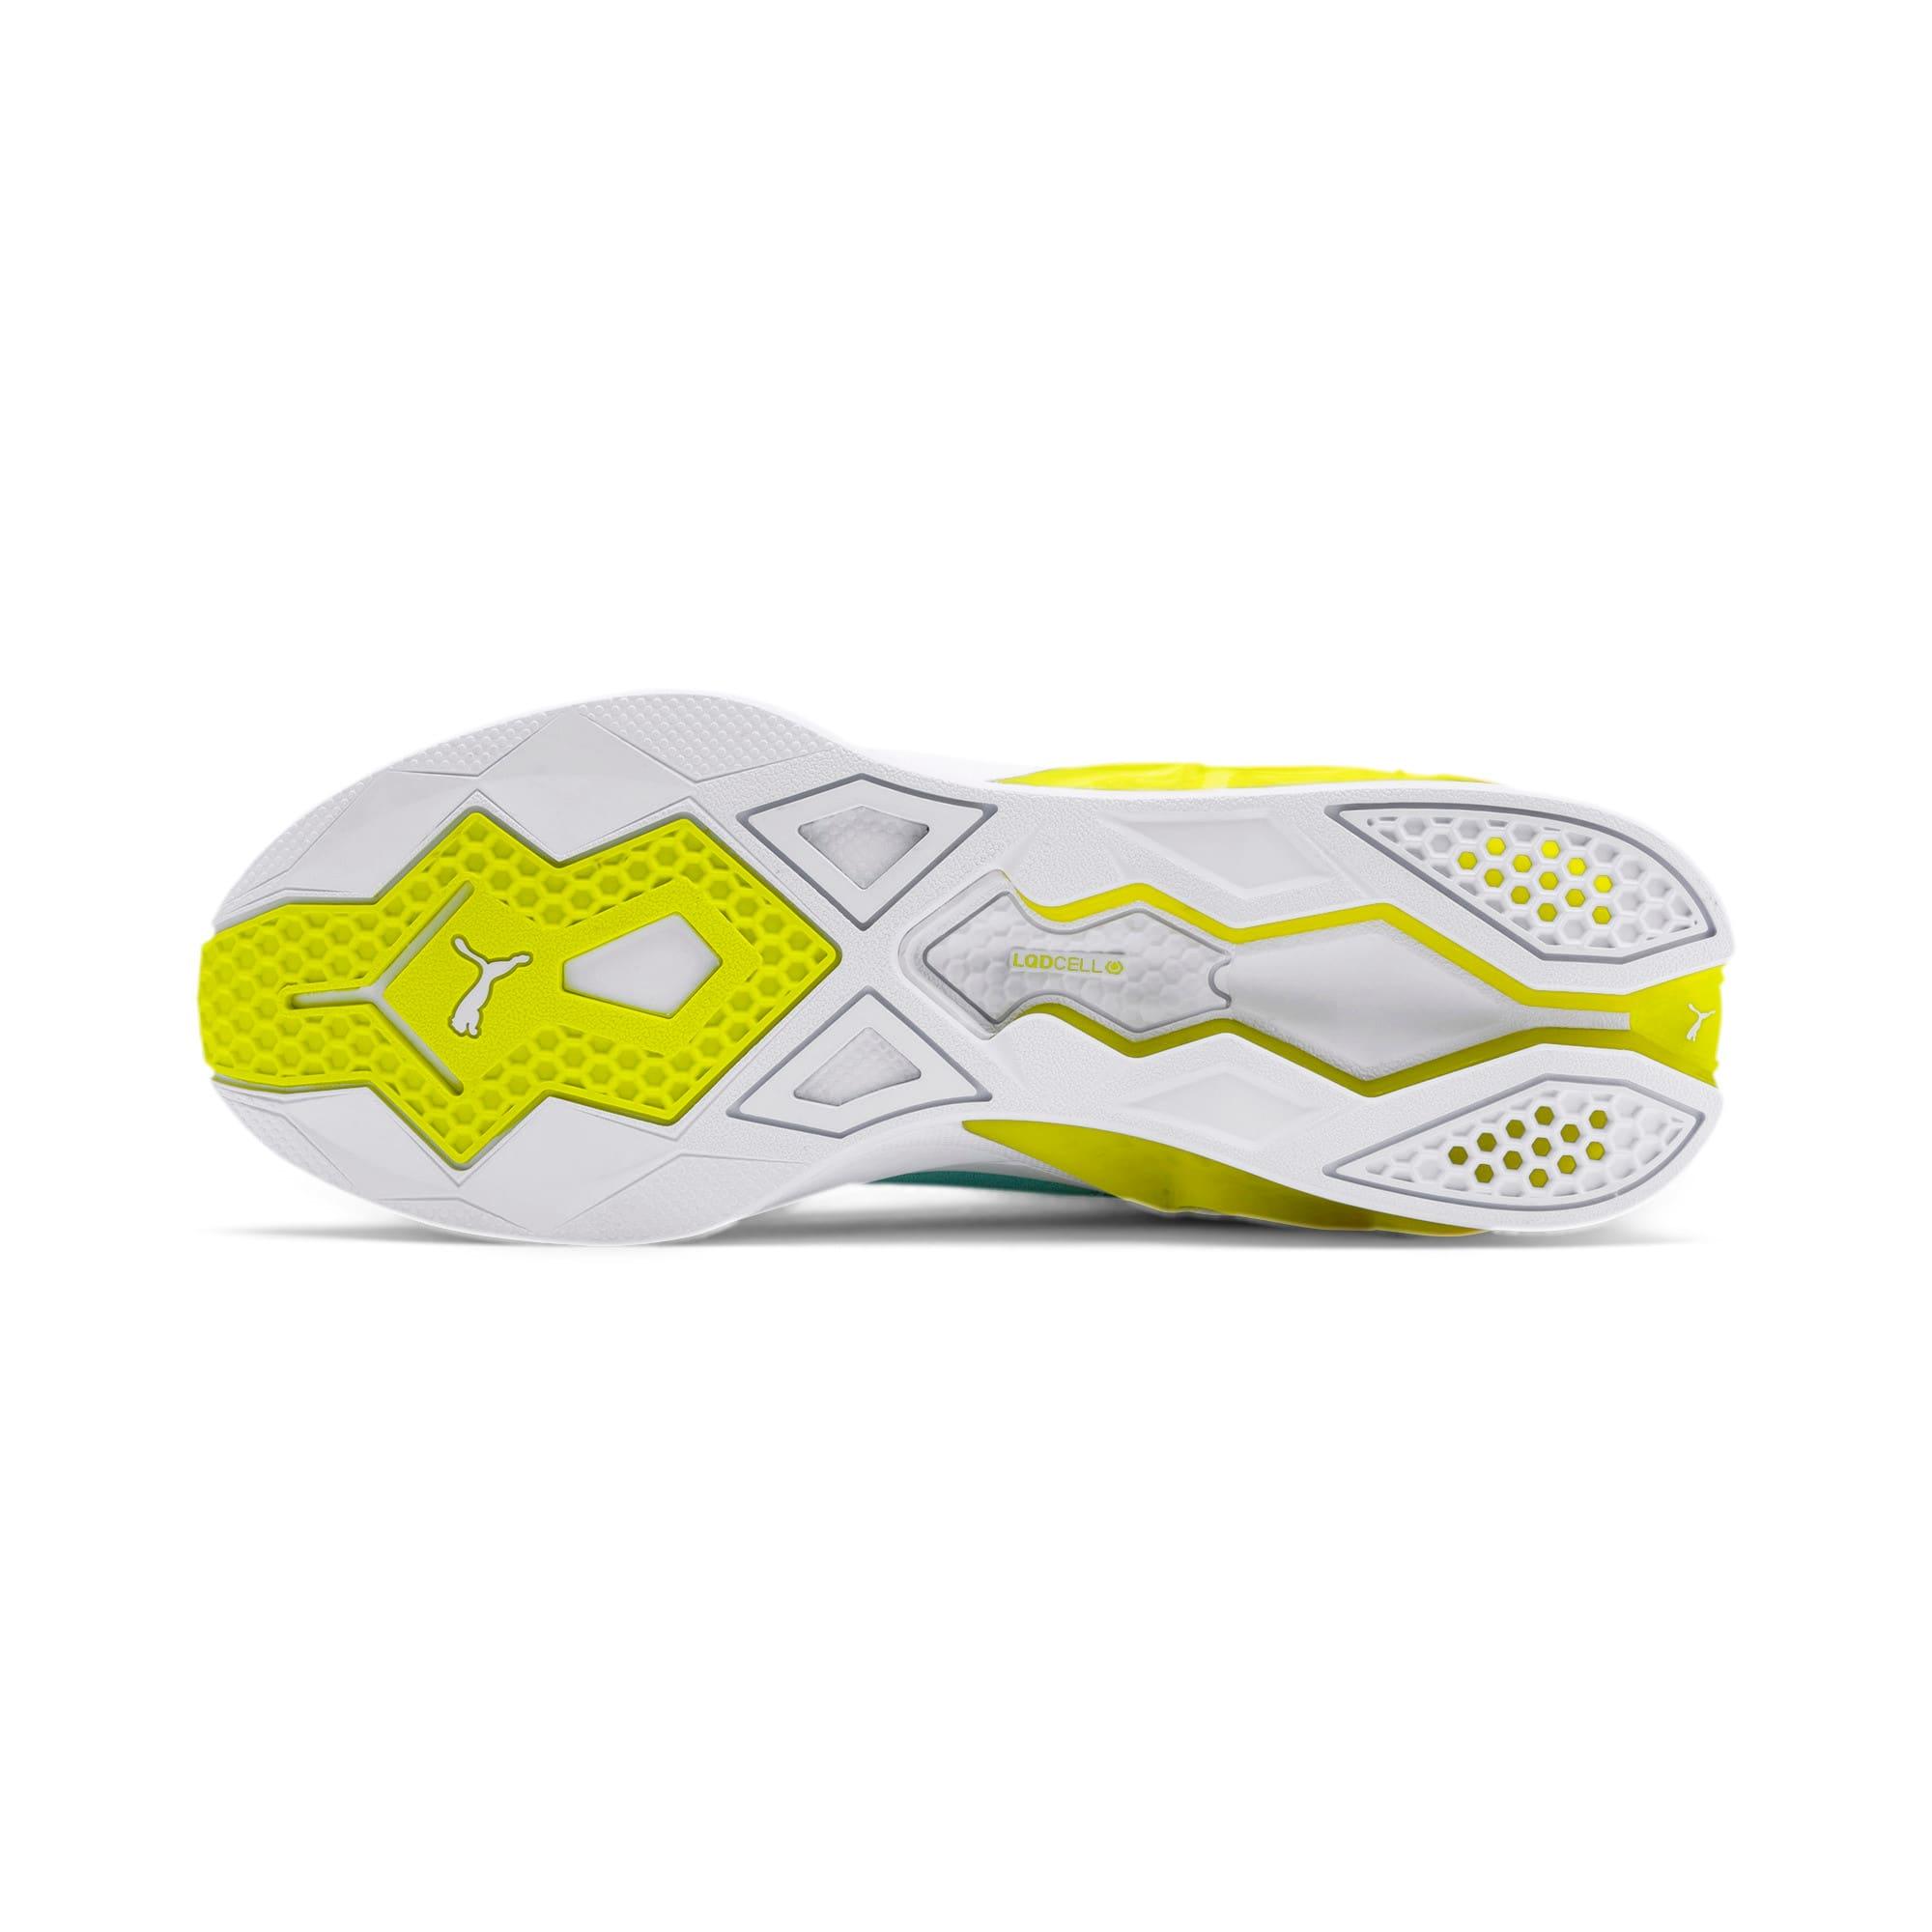 Miniatura 5 de Zapatos de entrenamientoLQDCELL Origin para hombre, Puma White-Yellow Alert, mediano